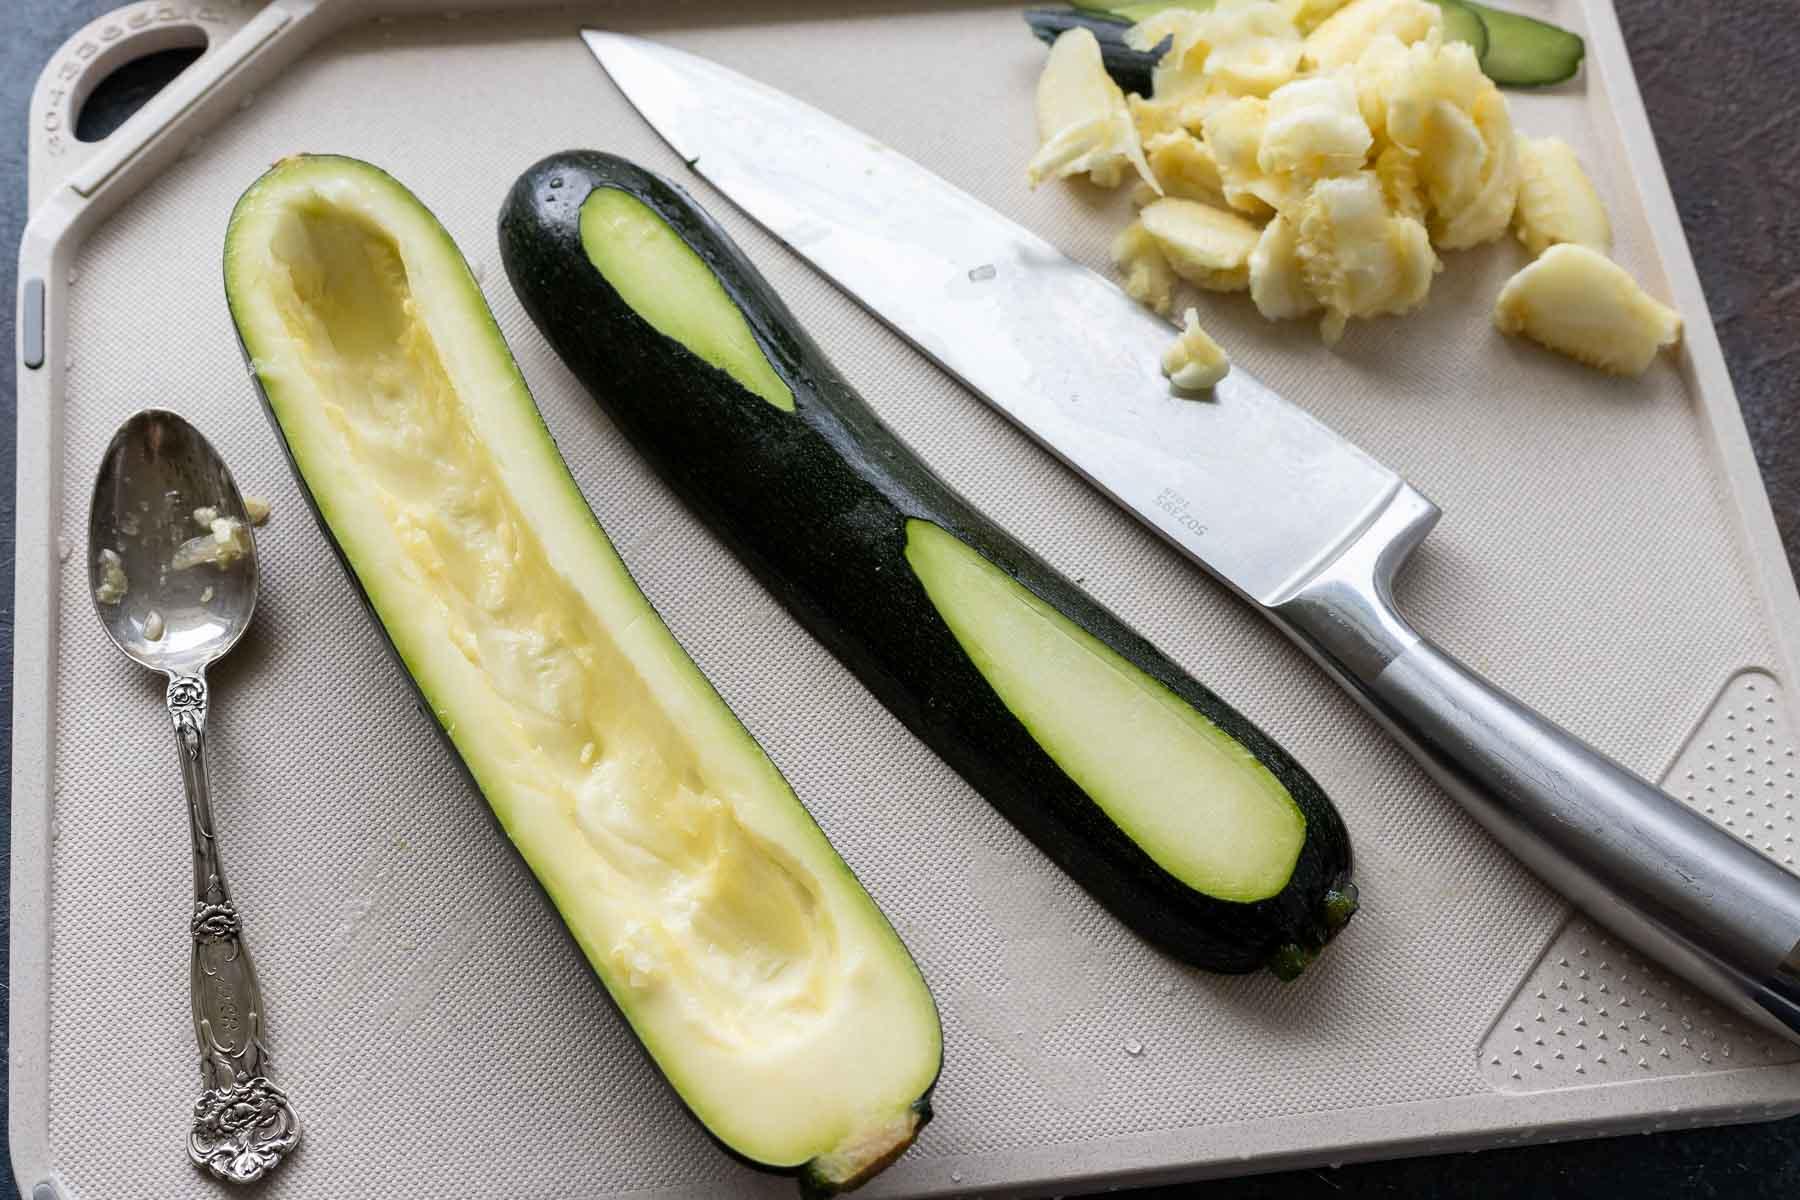 zucchini on cutting board next to knife